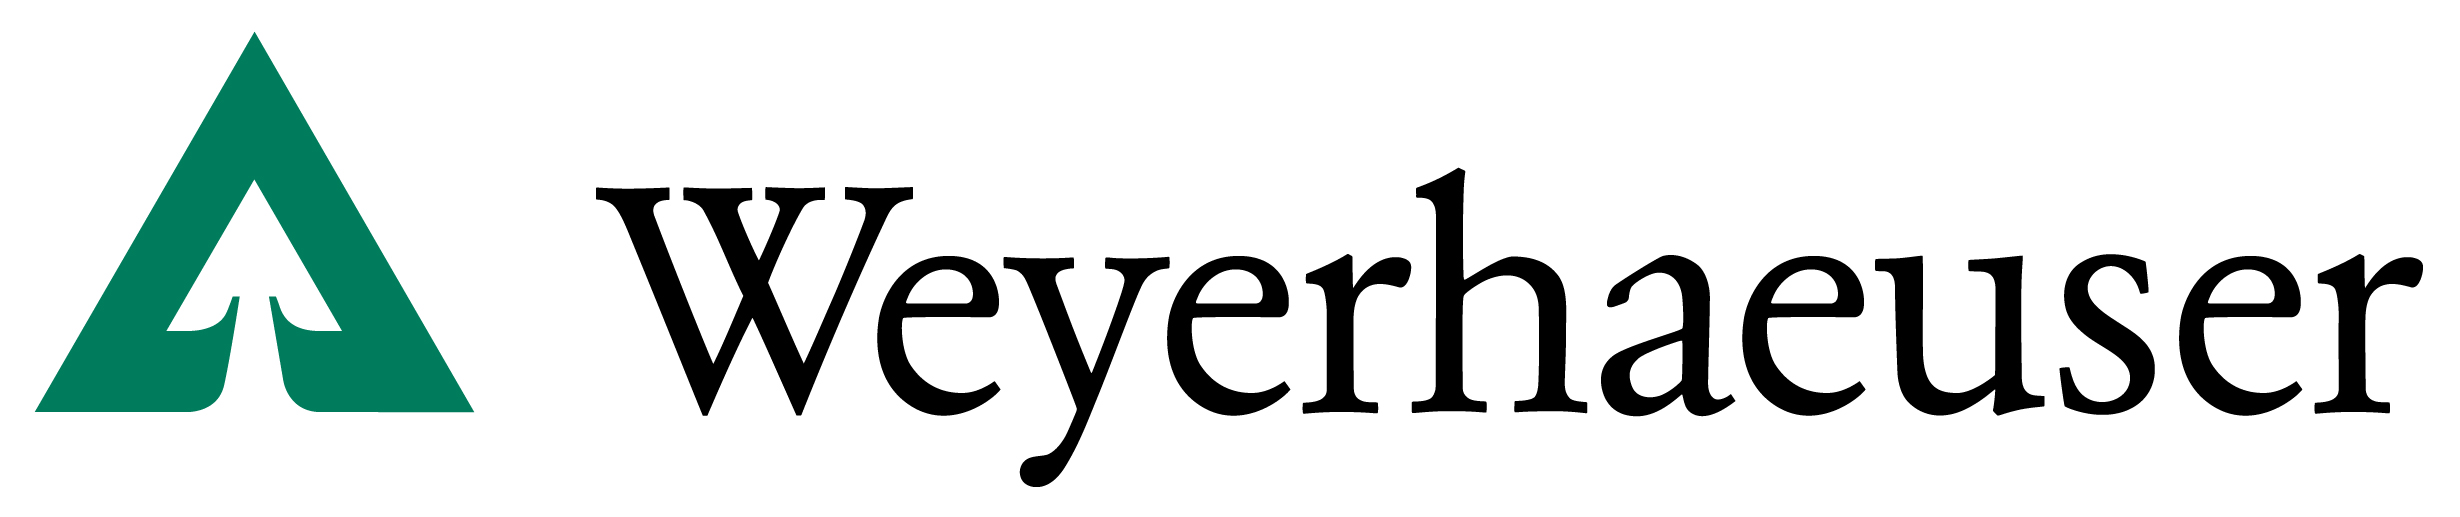 2019 Manufacturing Day Timber Tour: Weyerhaeuser & F H